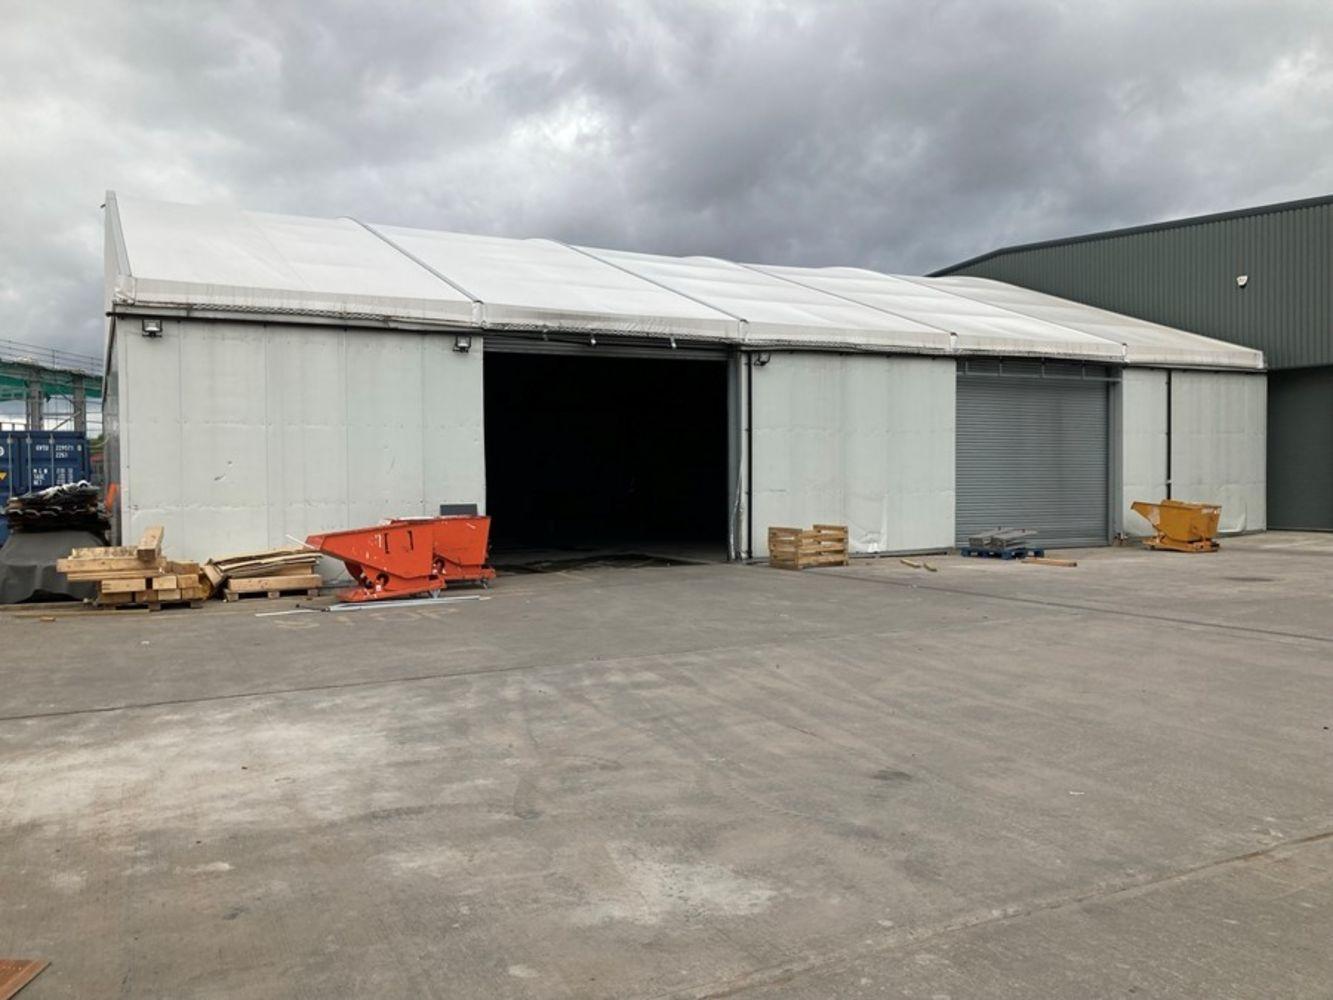 Range of Woodworking Equipment, Garage Equipment, Cranes, Modular Buildings, Access Platforms & Forklifts